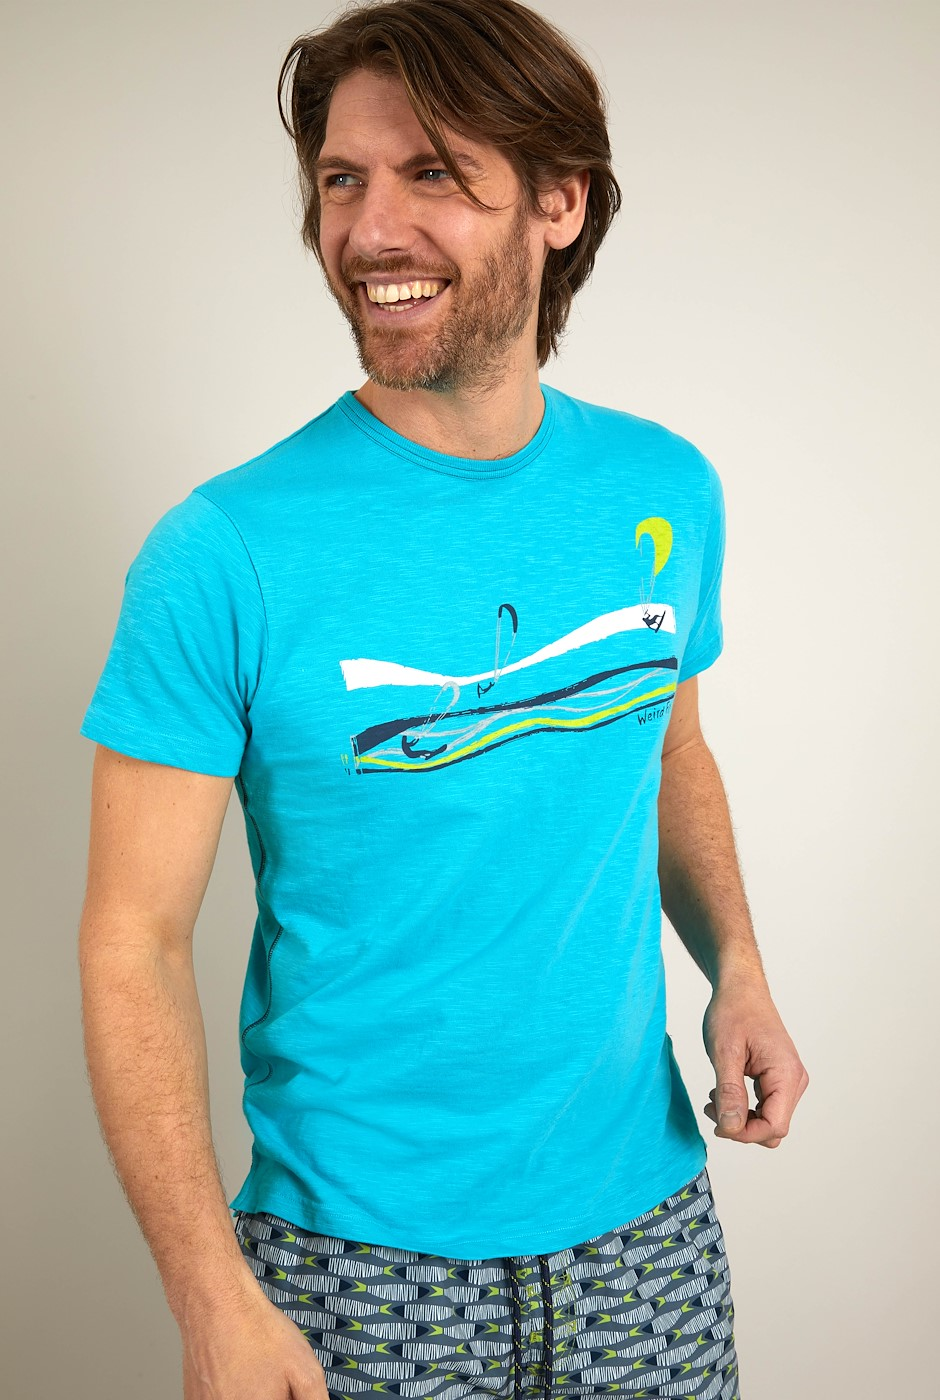 Kitesurfers Organic Cotton Graphic T-Shirt Turquoise